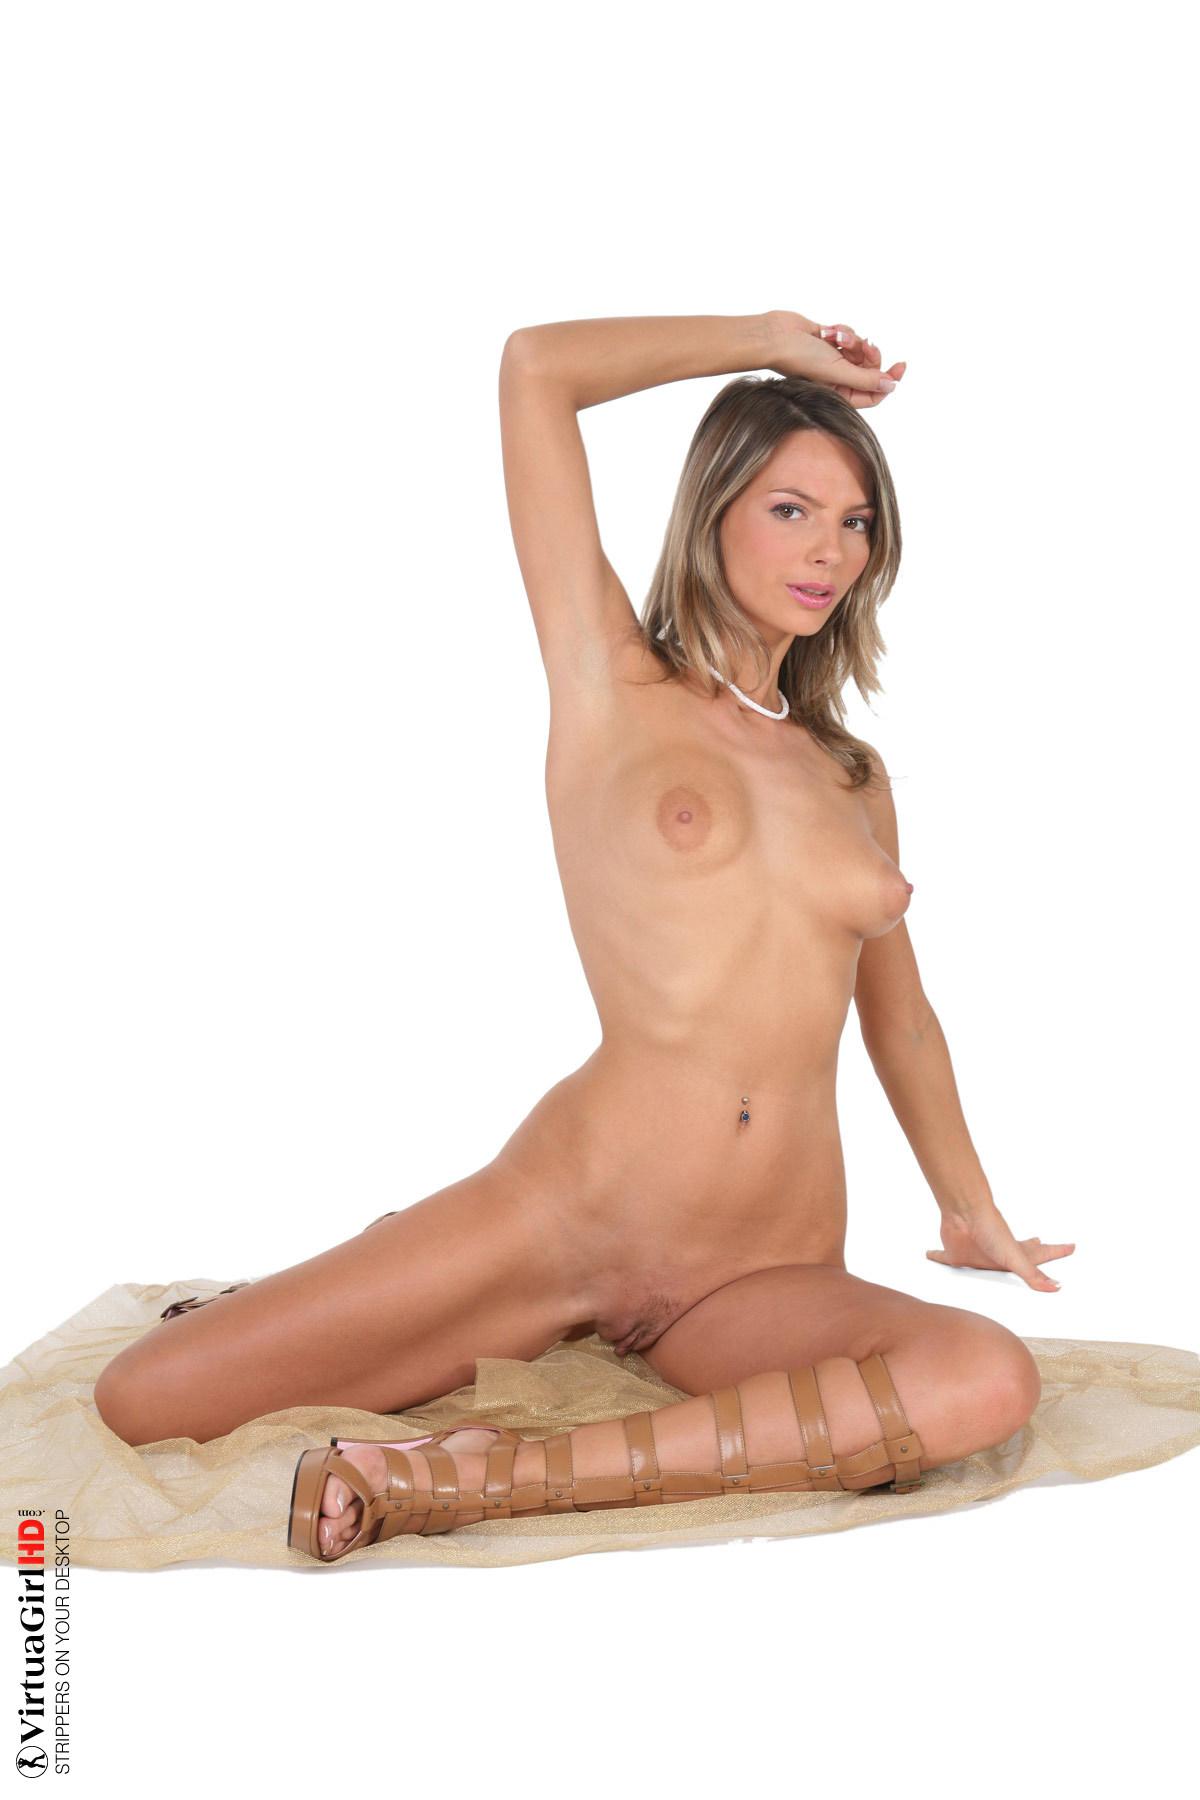 desktop stripper free download best